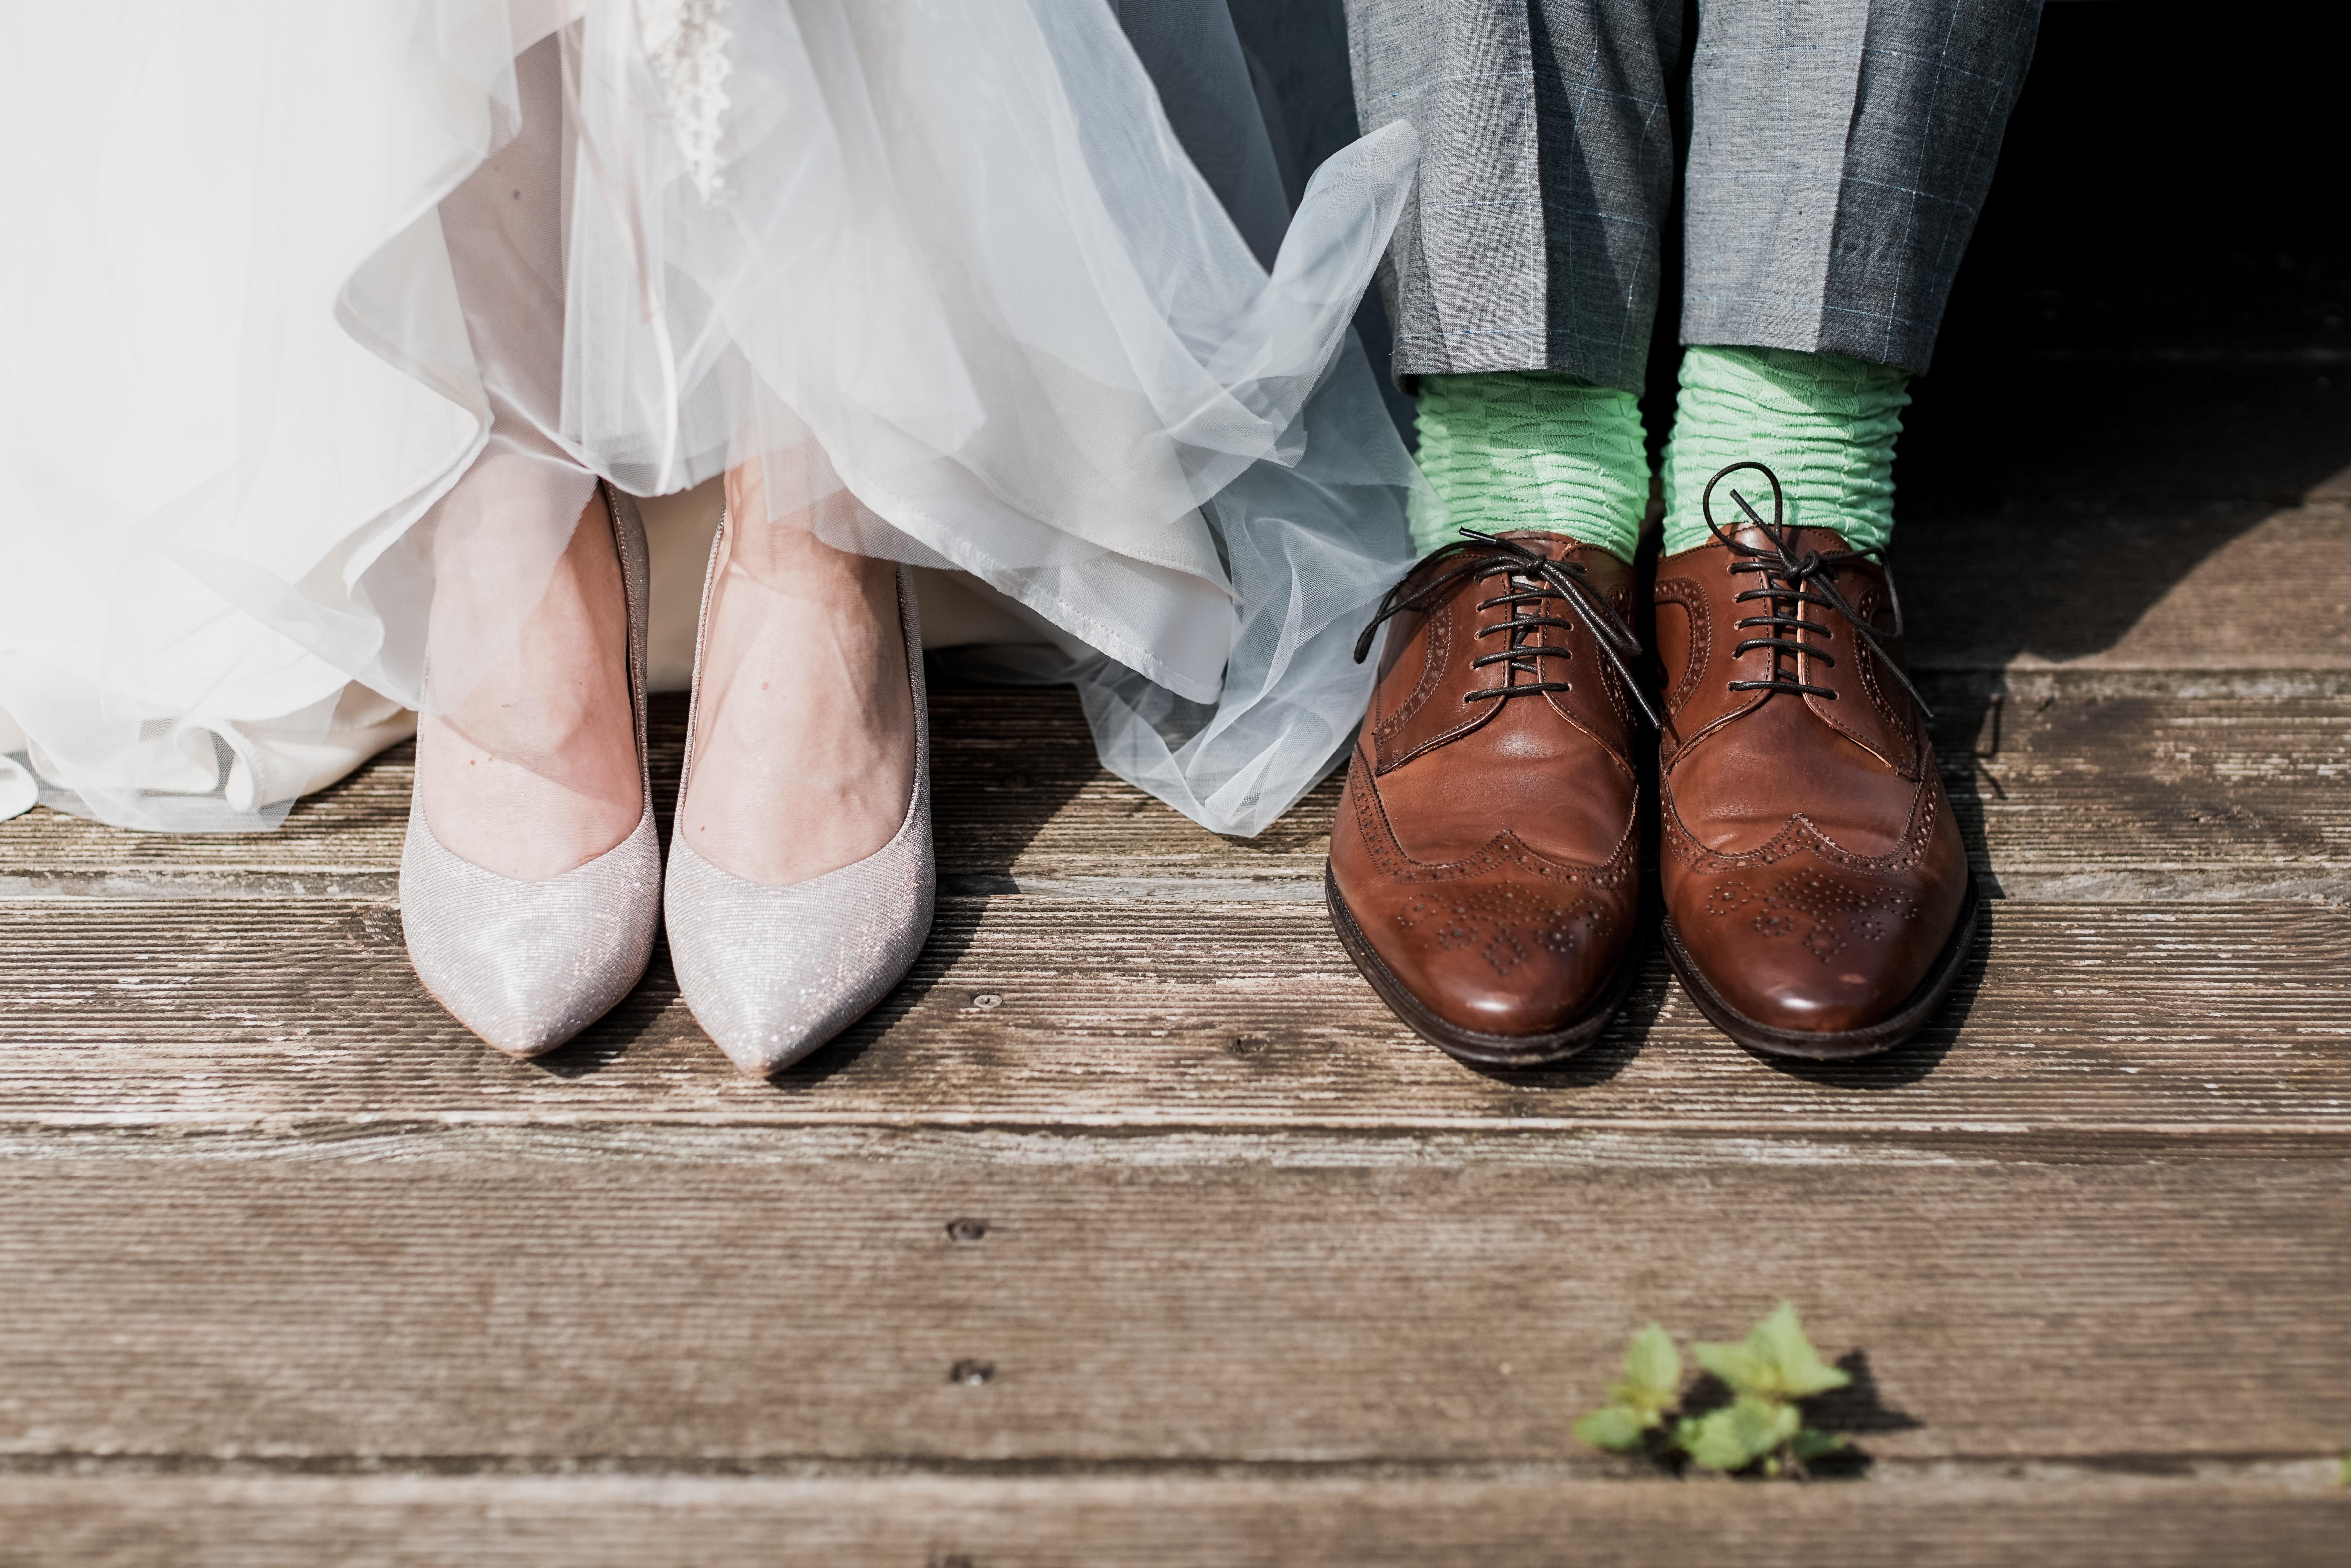 a wedding couple's shoes